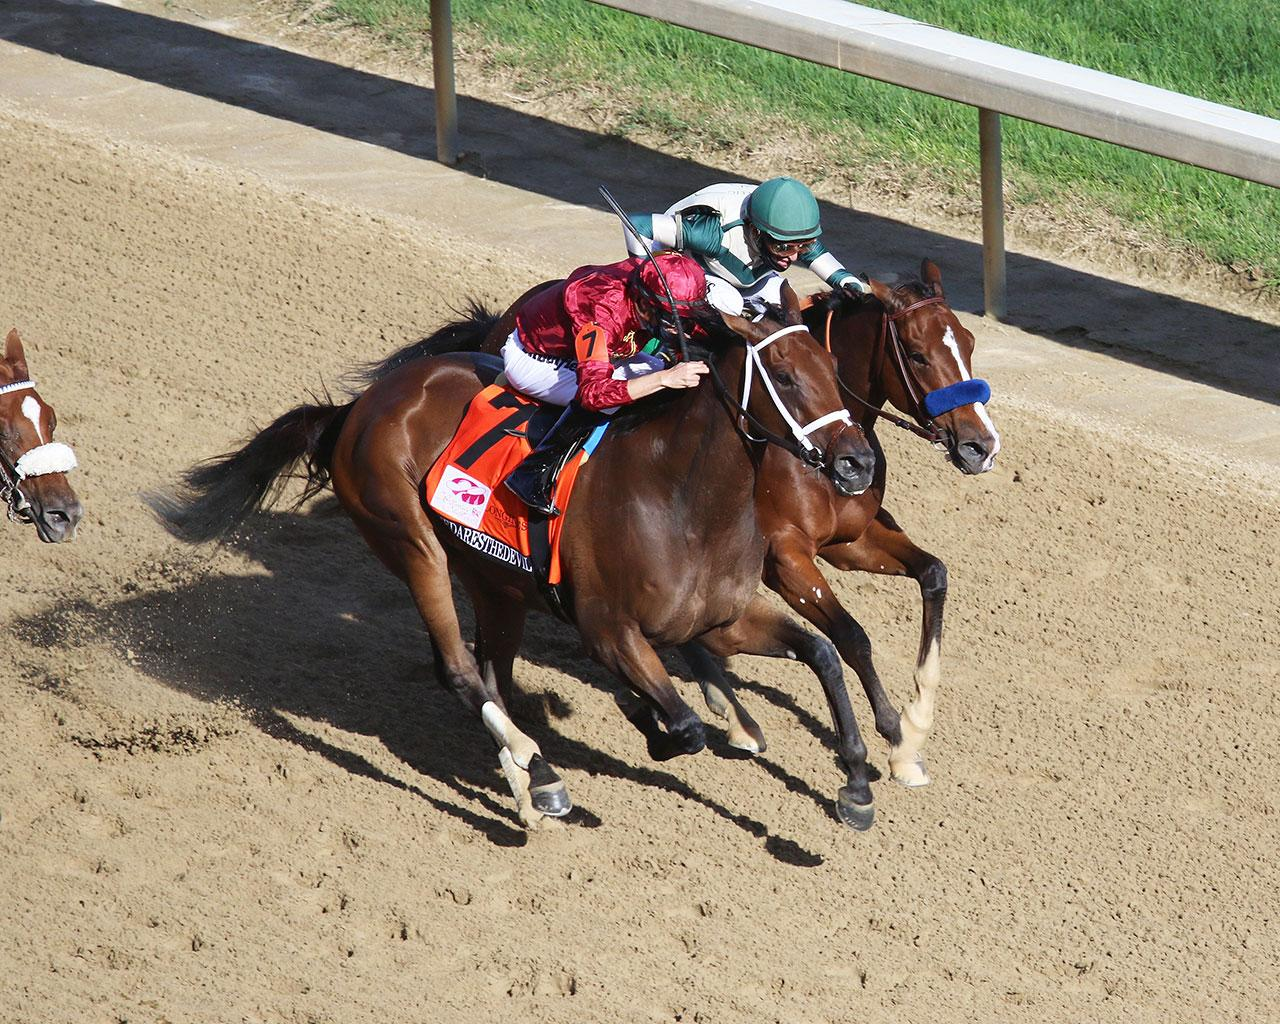 SHEDARESTHEDEVIL---The-Longines-Kentucky-Oaks---146th-Running---09-04-20---R12---CD---Aerial-Finish-02